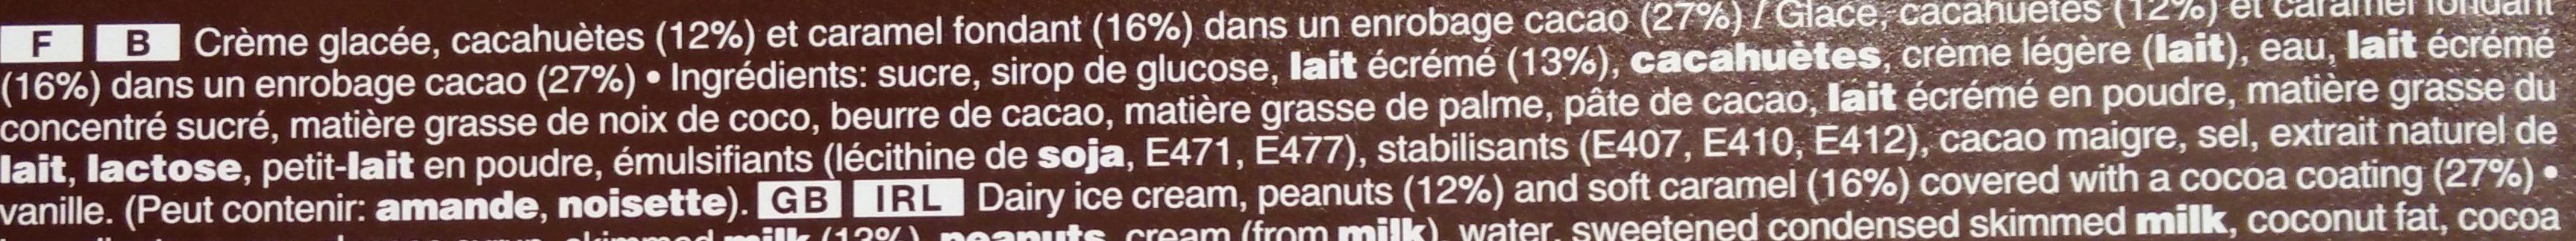 Snickers Ice Cream - Ingrédients - fr